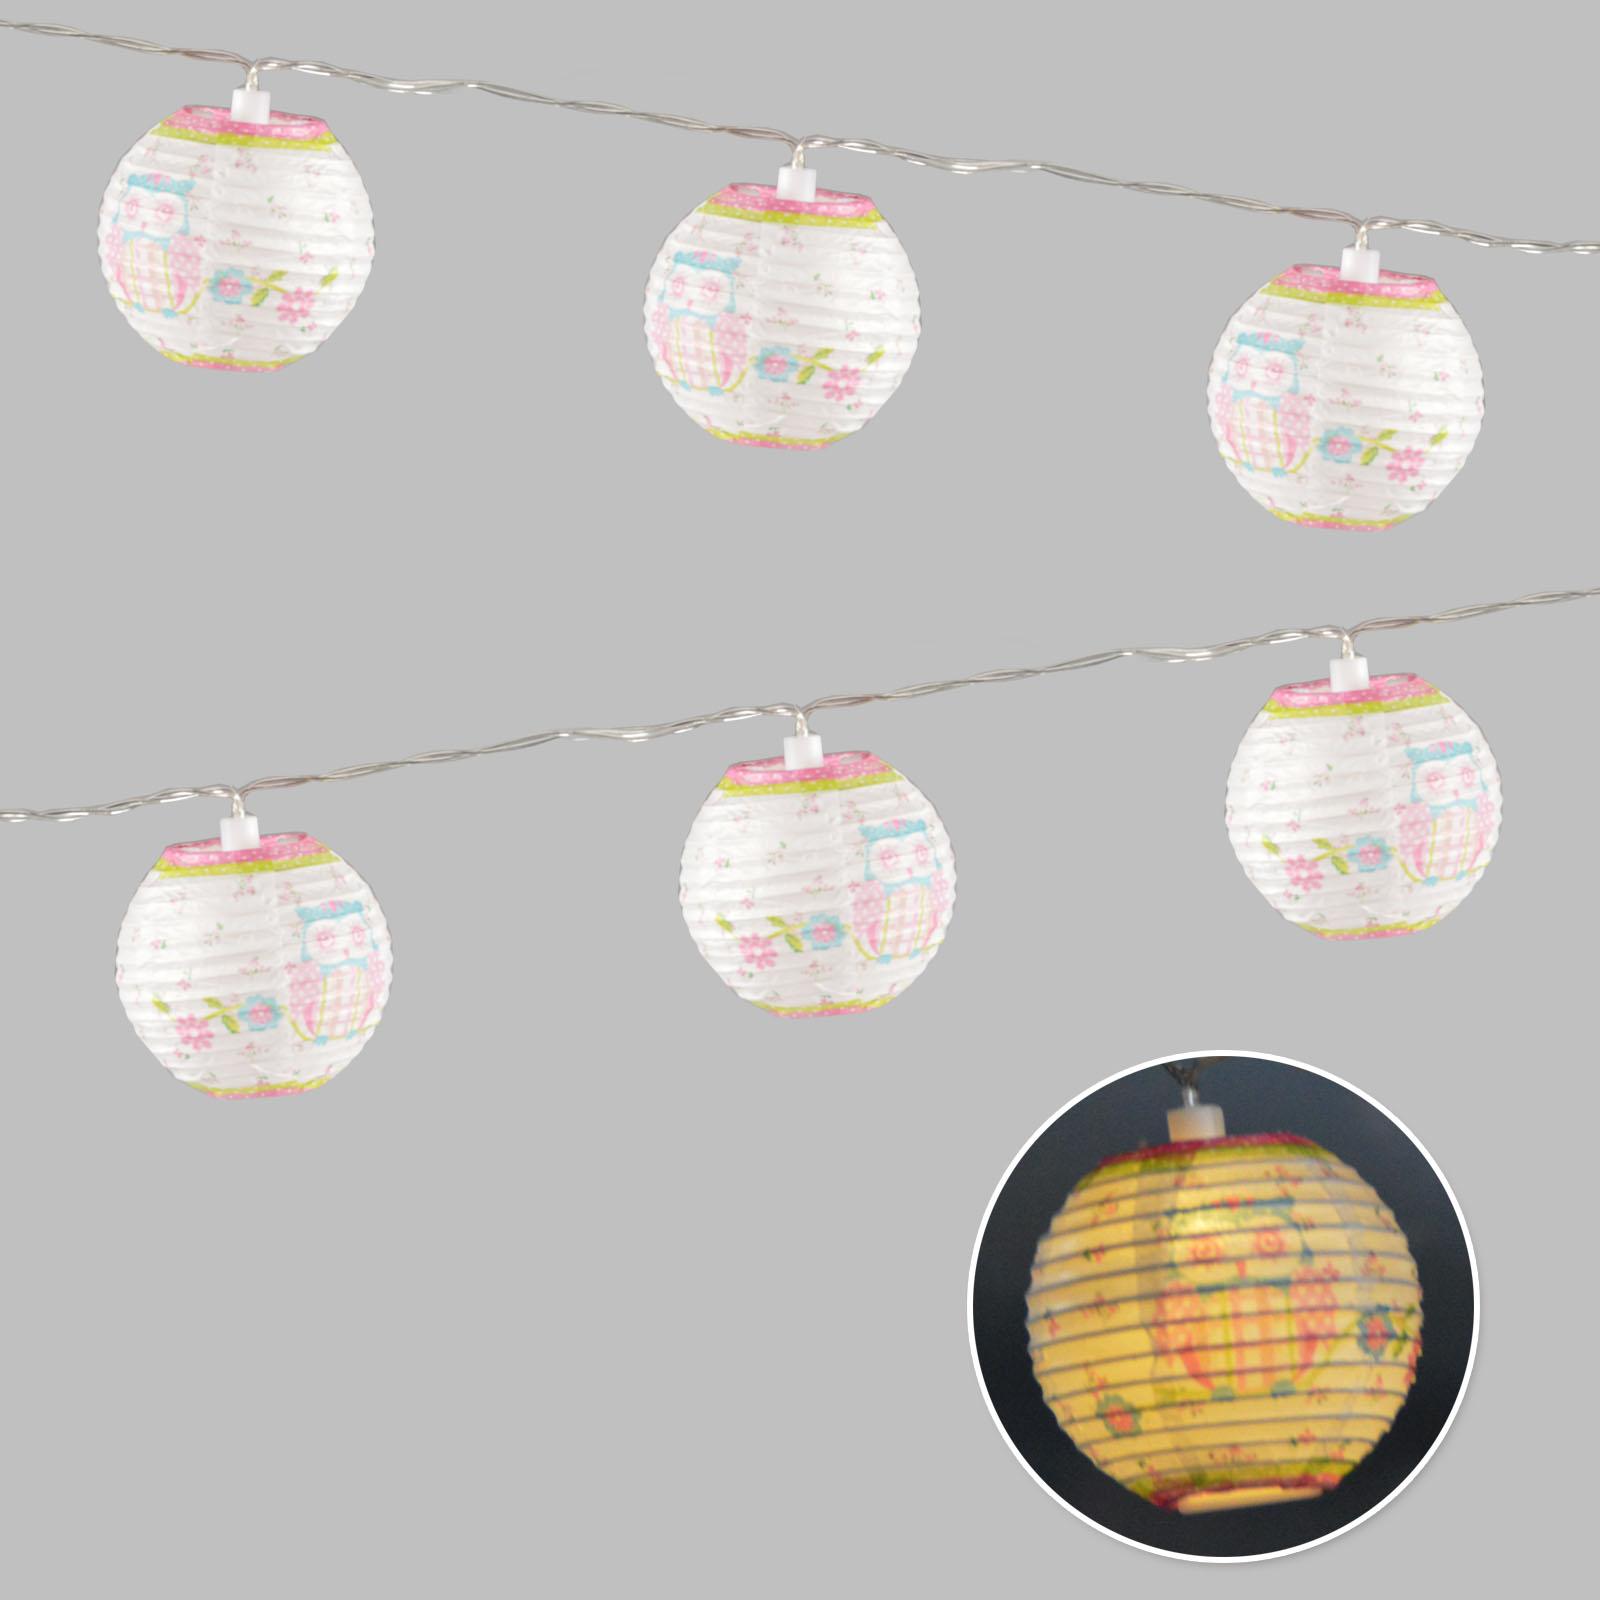 10 led lichterkette eule papierlampion lampion kugel garten party lichterkette. Black Bedroom Furniture Sets. Home Design Ideas